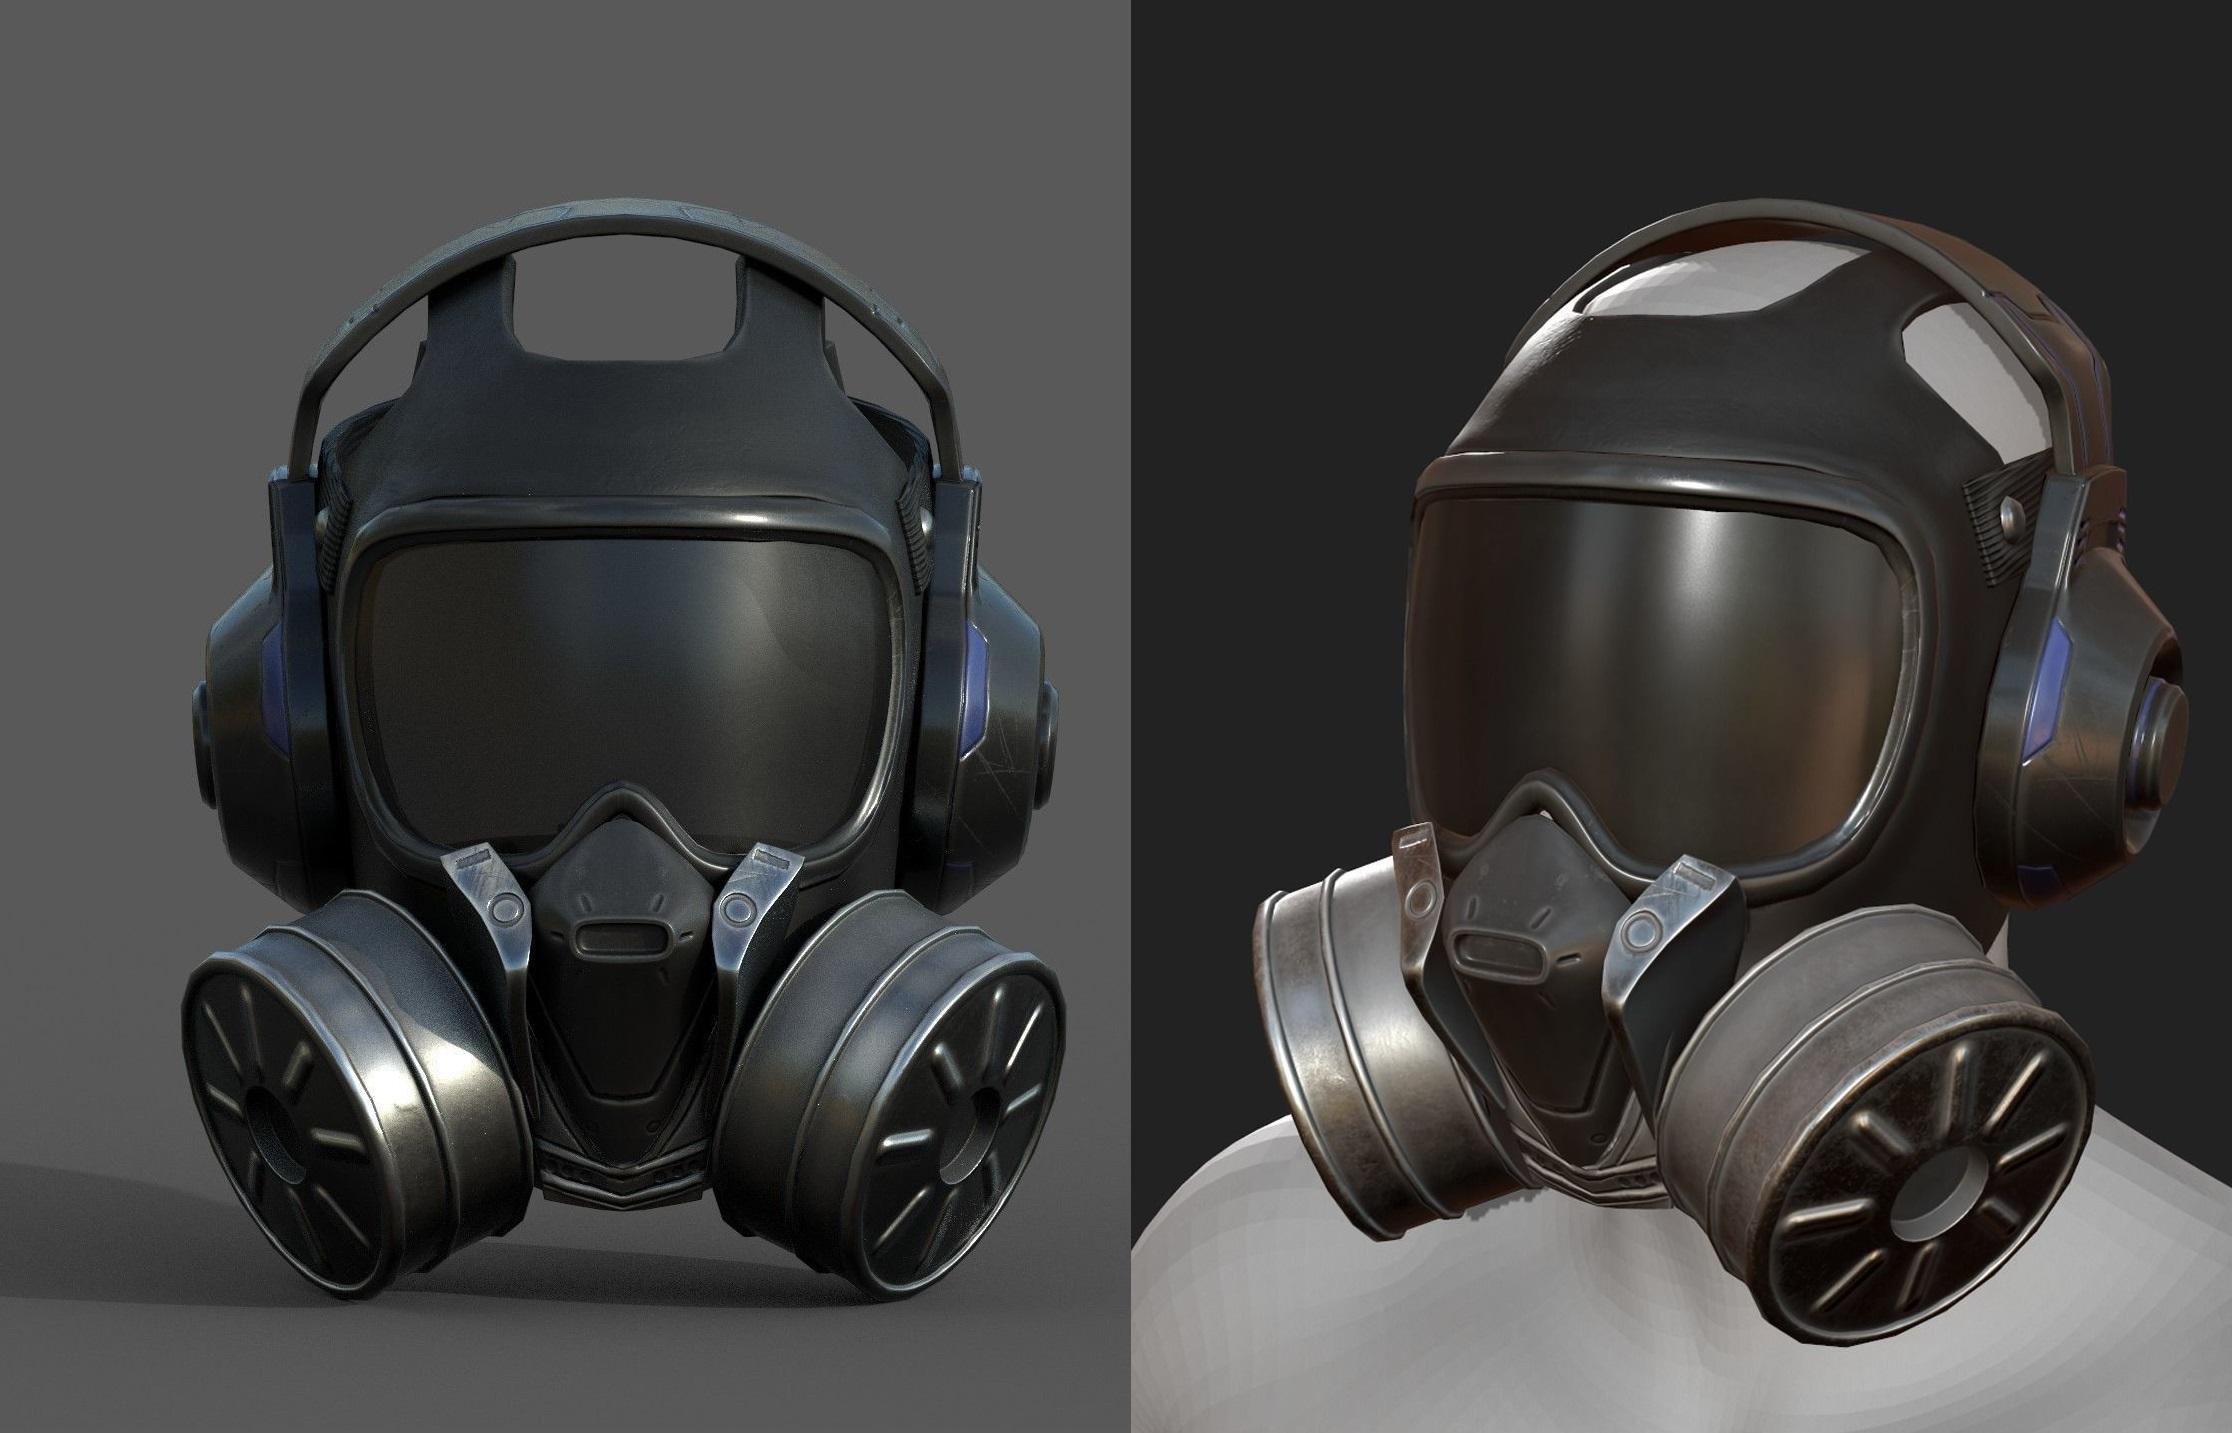 gas-mask-helmet-3d-model-scifi-3d-model-low-poly-obj-mtl-fbx-ma-mb (1) | 3d artist